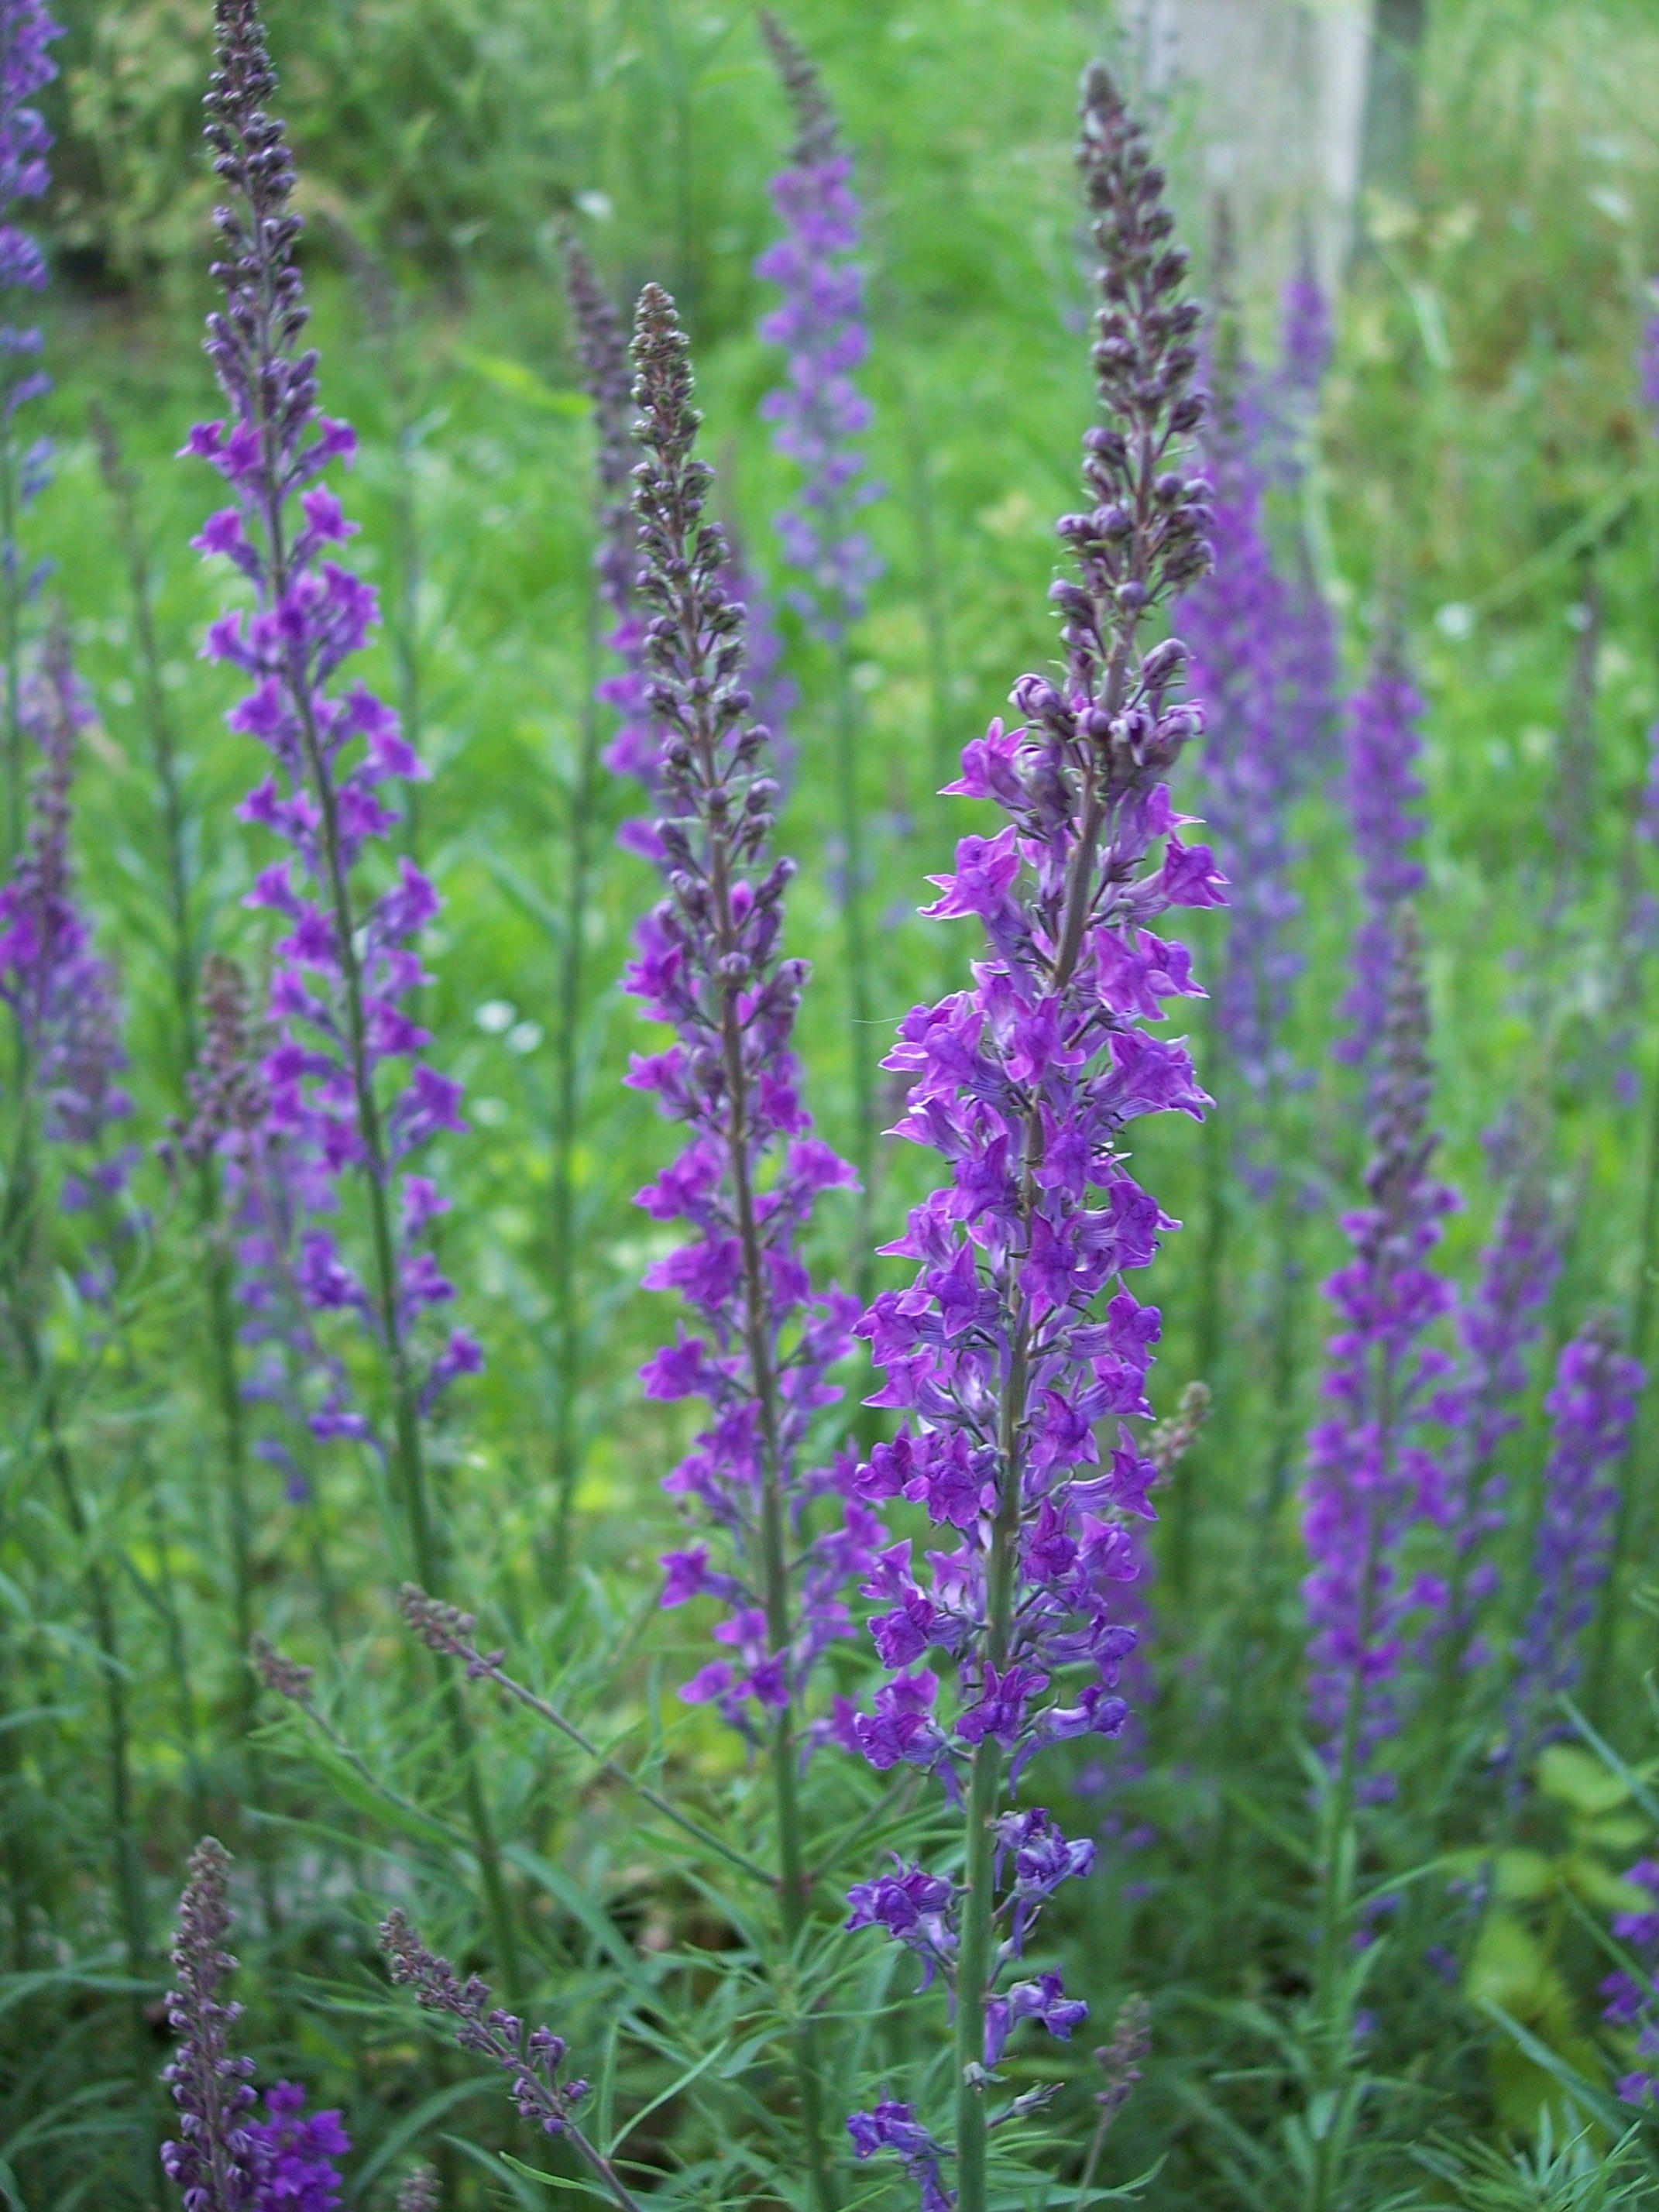 Linaria purpurea Purple Toadflax (Linaria purpurea